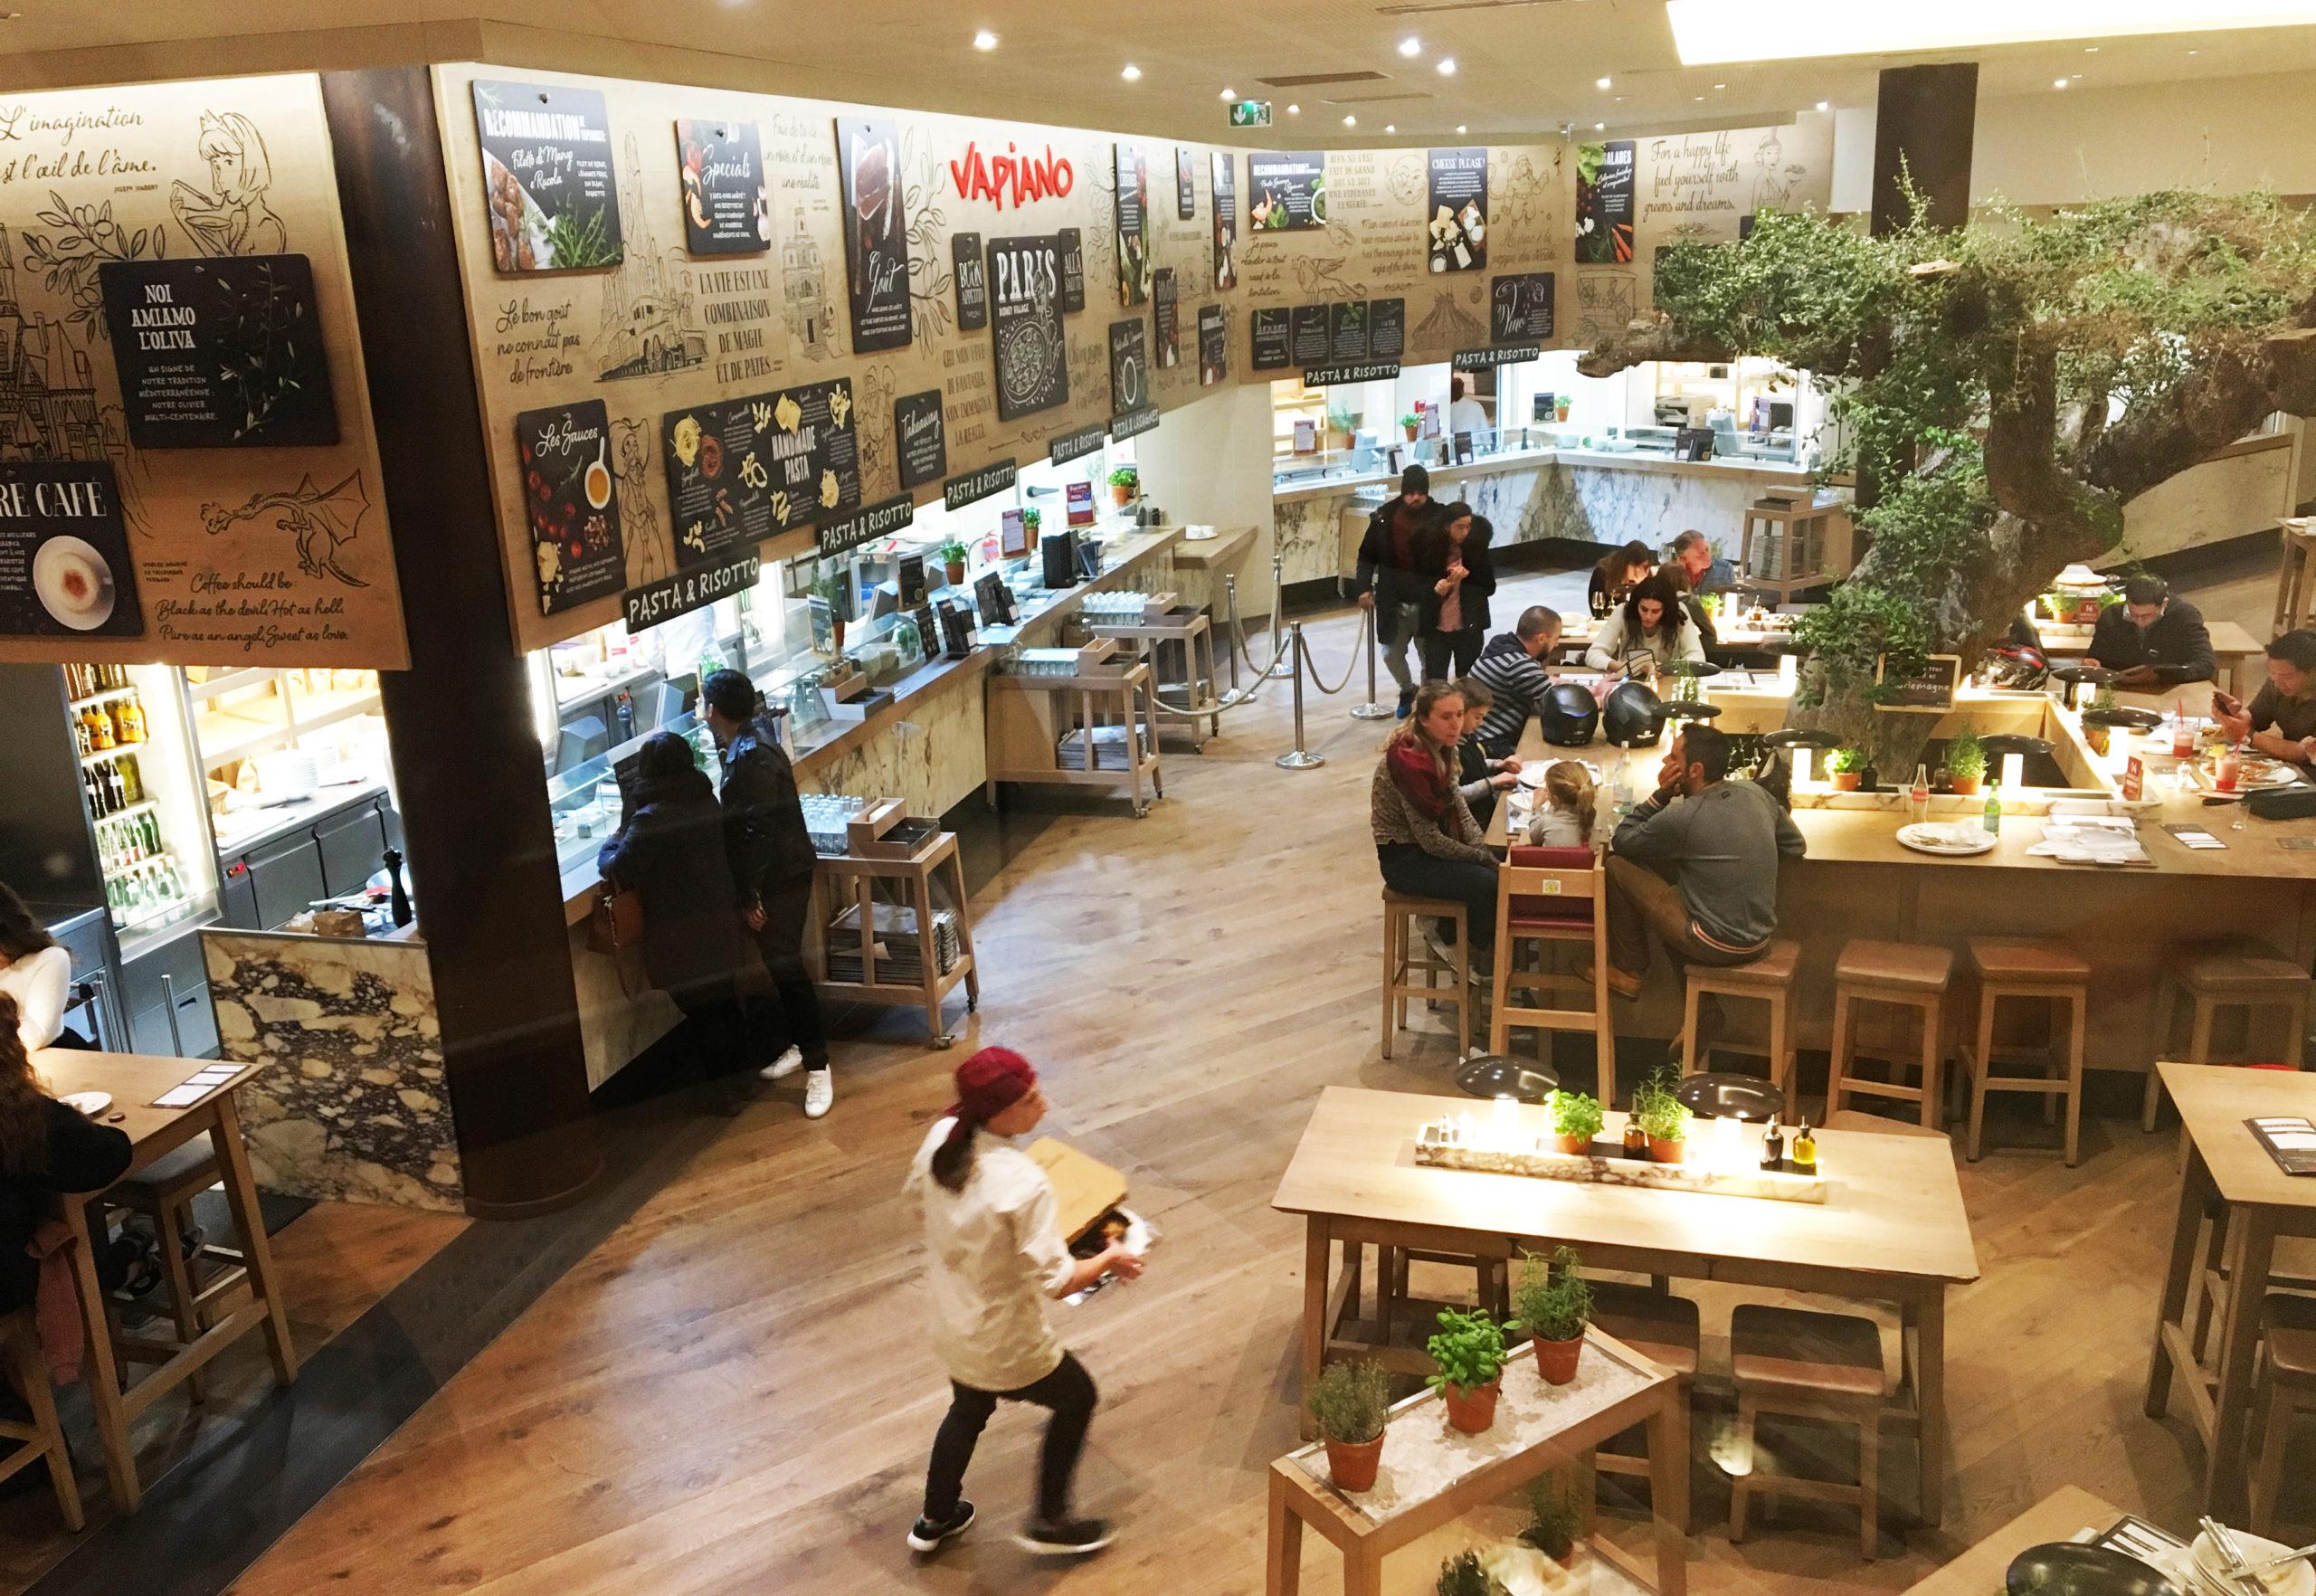 Salle restaurant Vapiano Disney